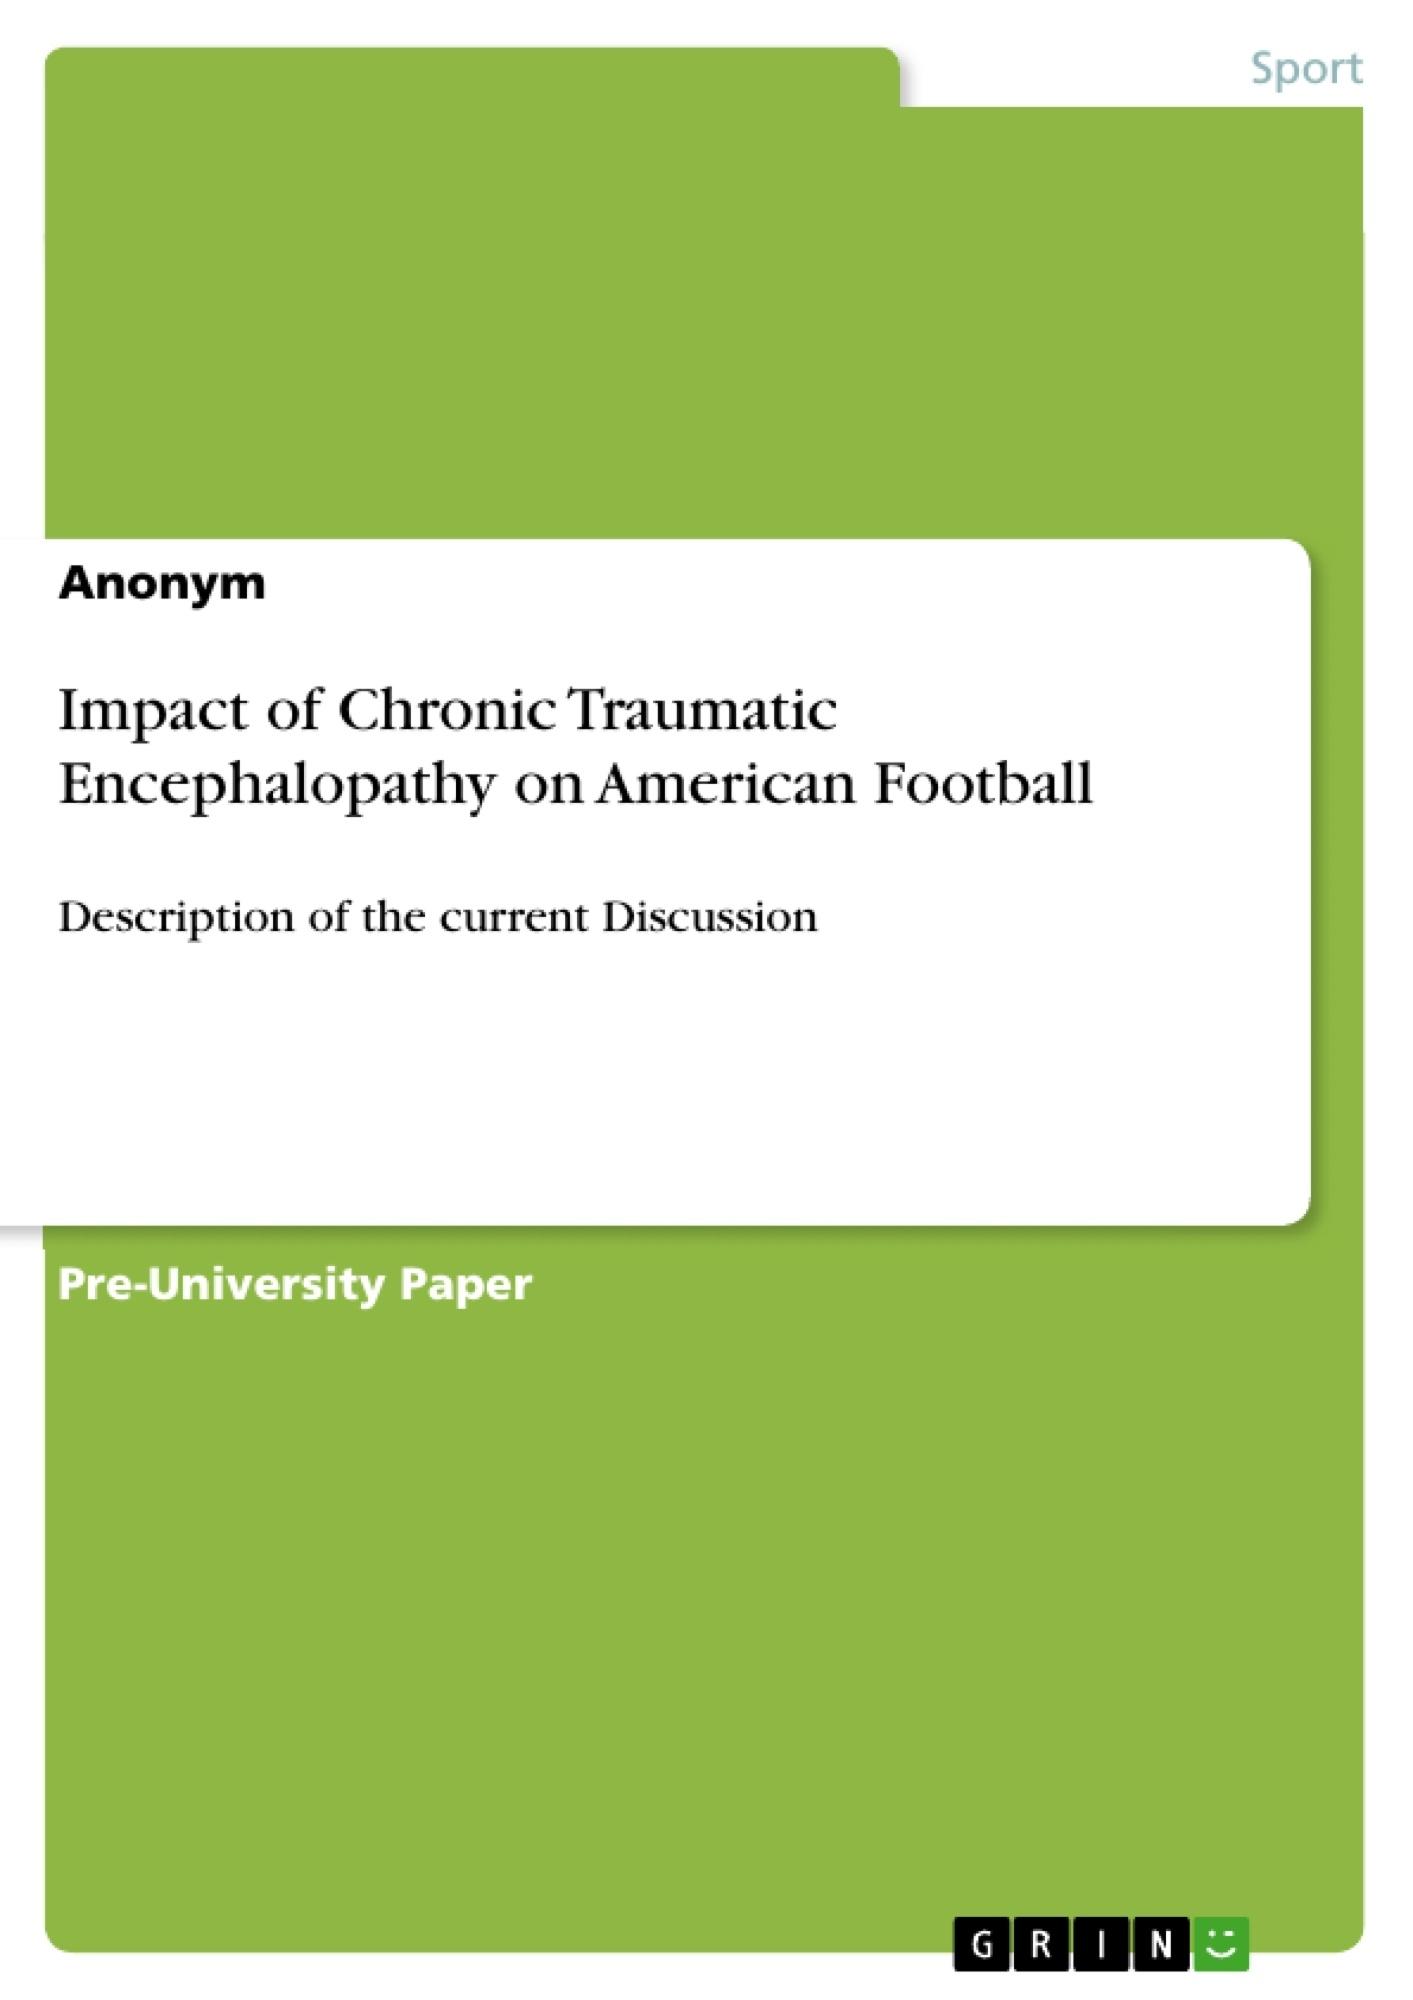 Title: Impact of Chronic Traumatic Encephalopathy on American Football